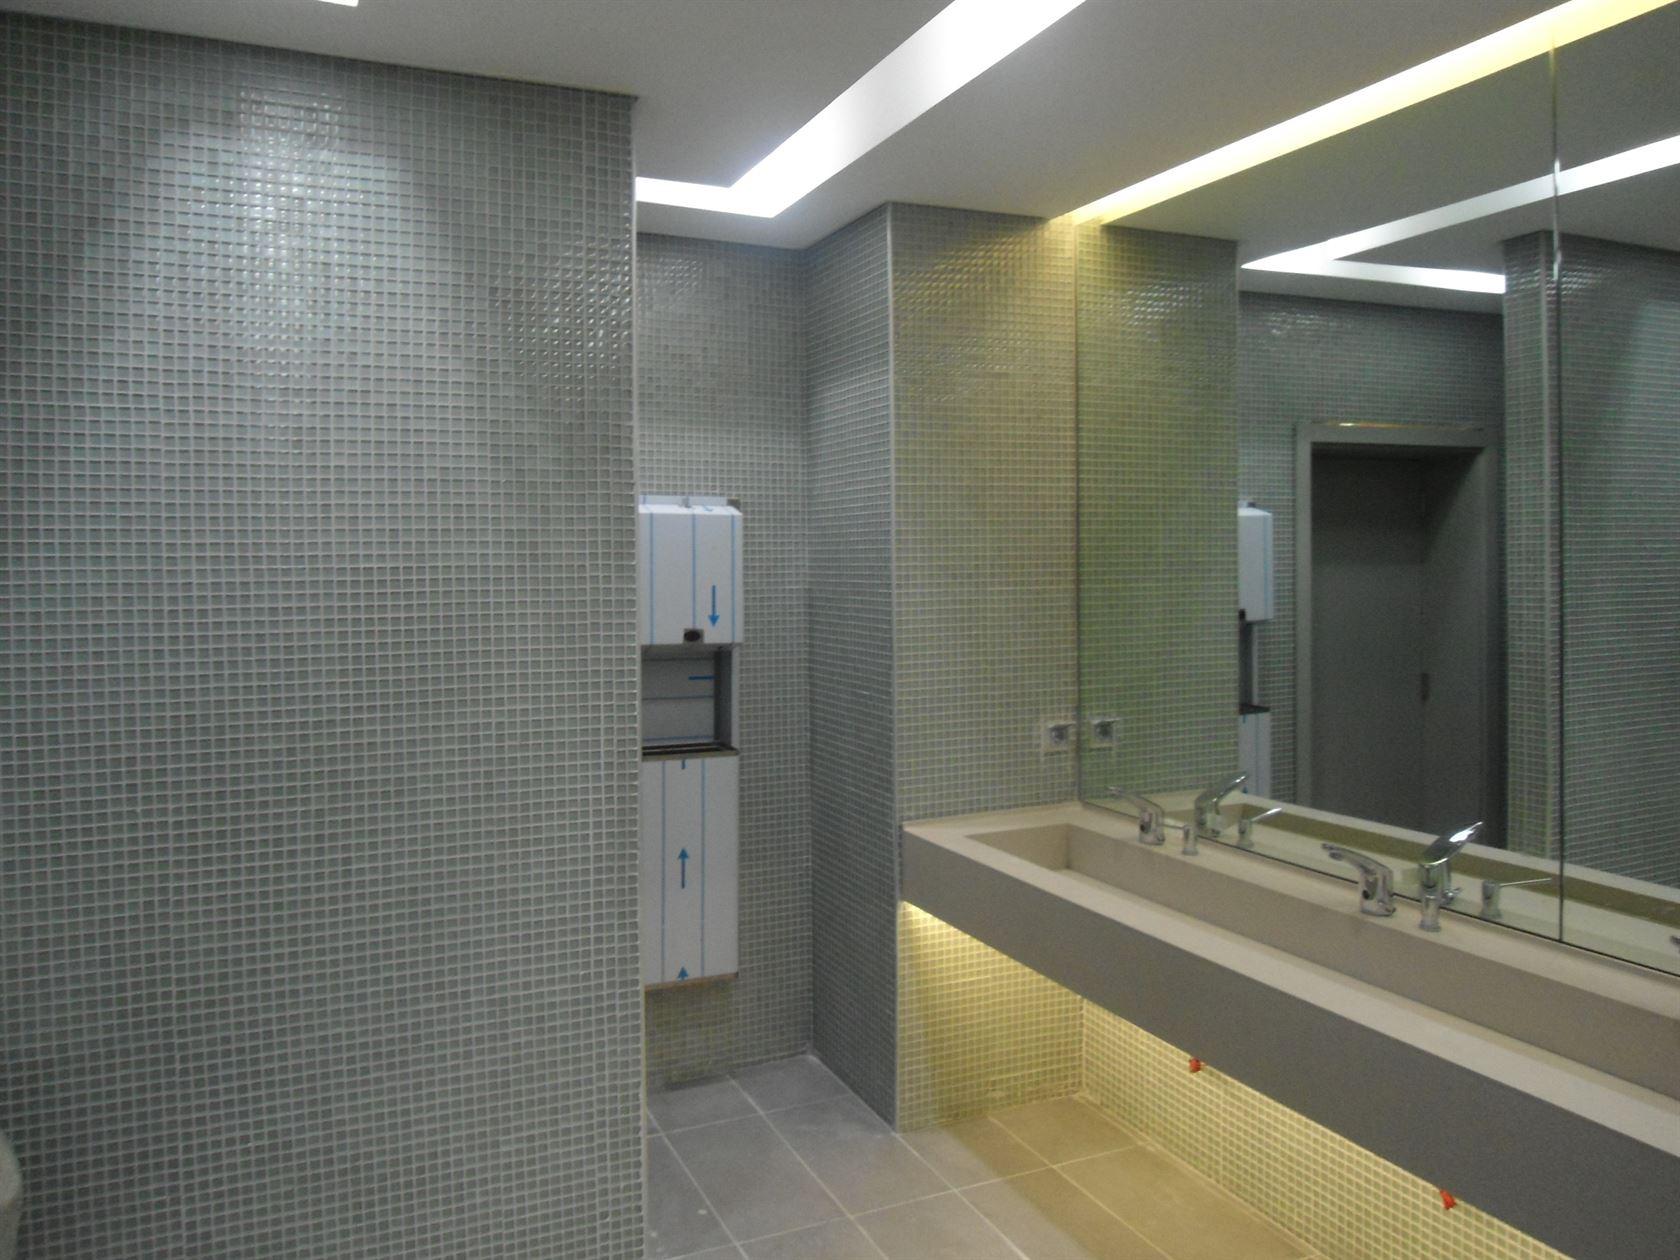 - HÜRRİYET GAZETESİ ERKEK WC, İST 4  | Betaş